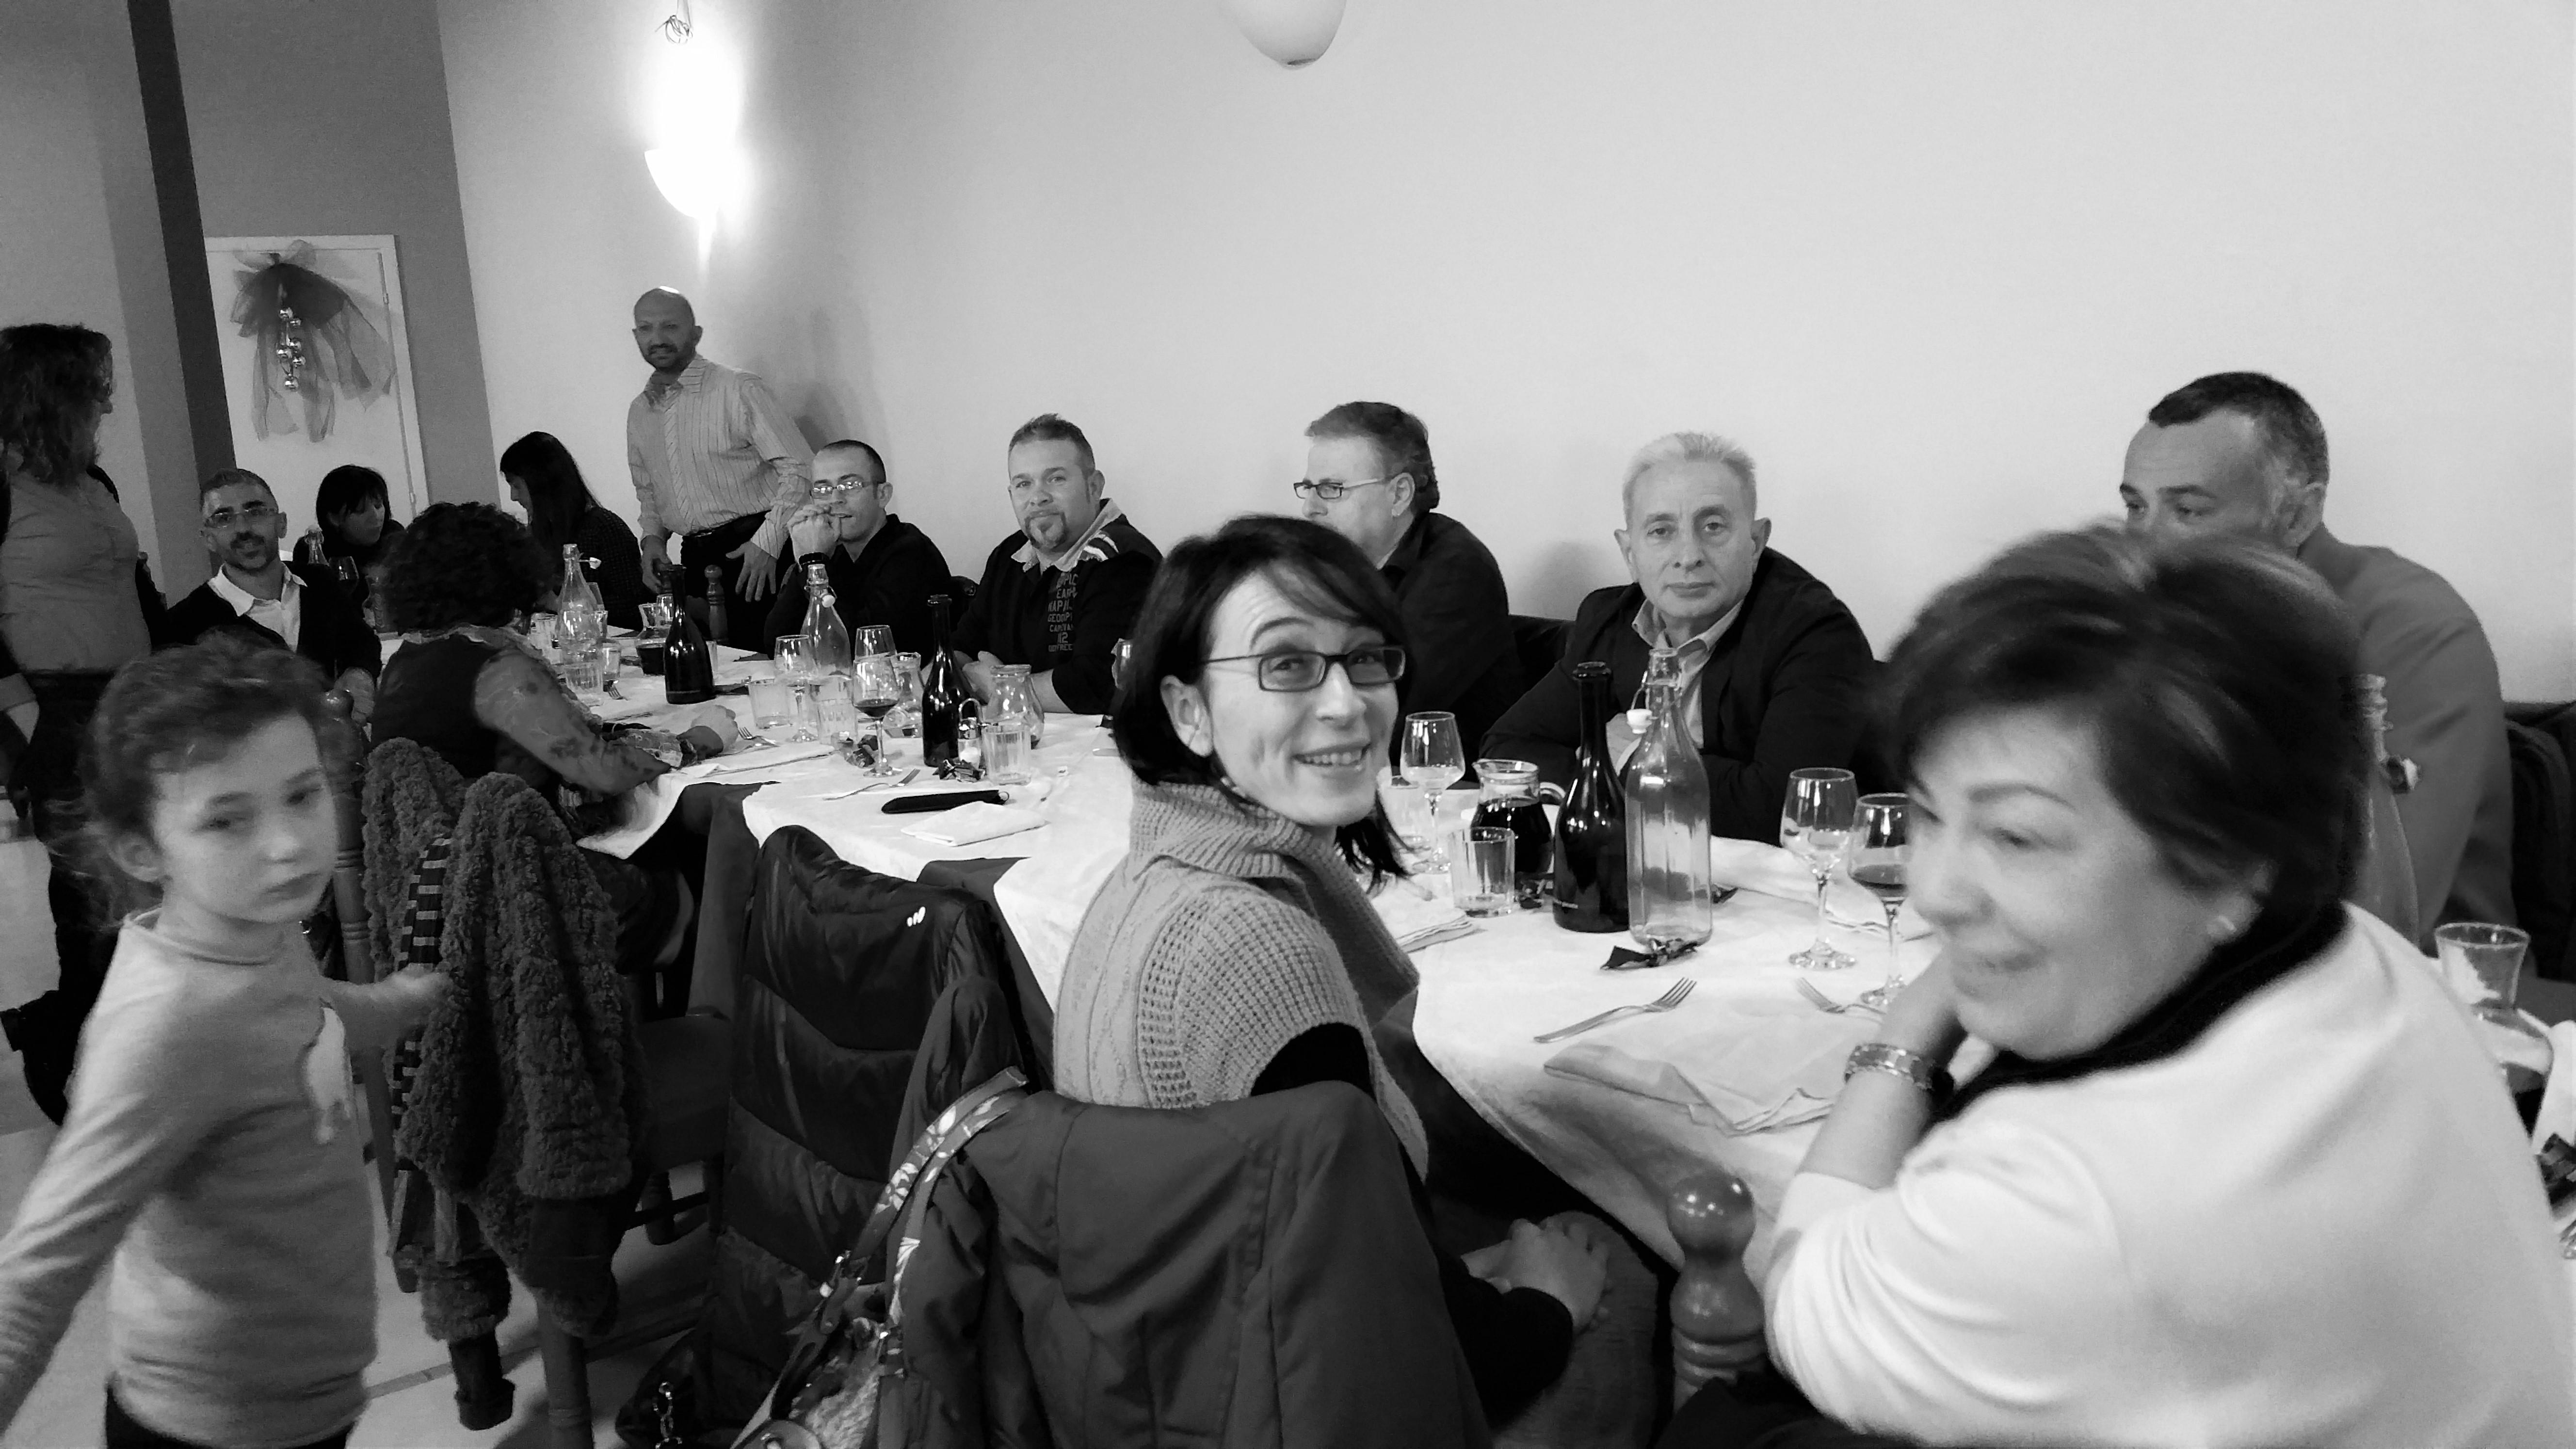 pranzo natale 2015 (4)